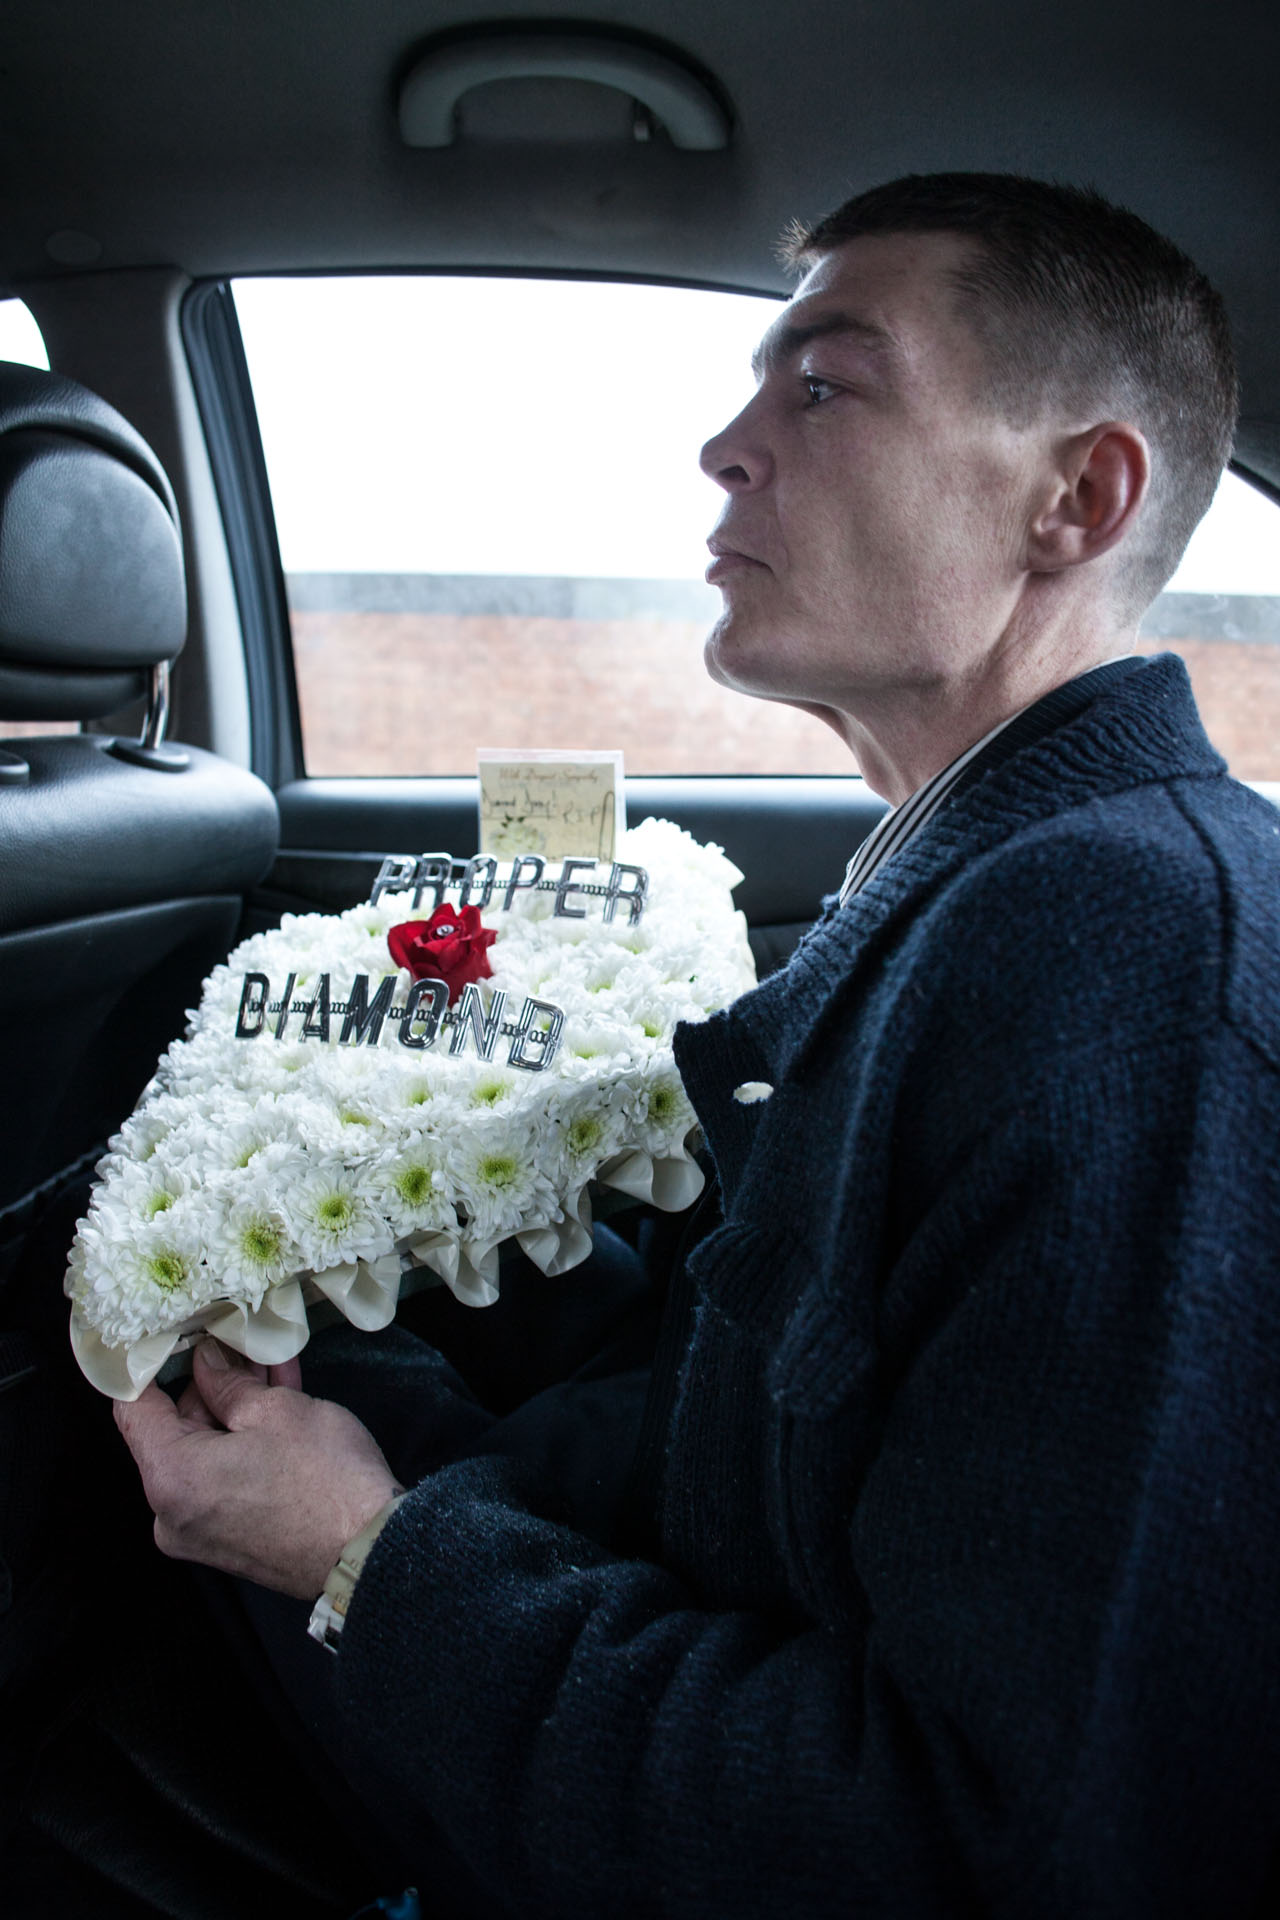 Mourner at funeral of Danny Woollard, East End gangster